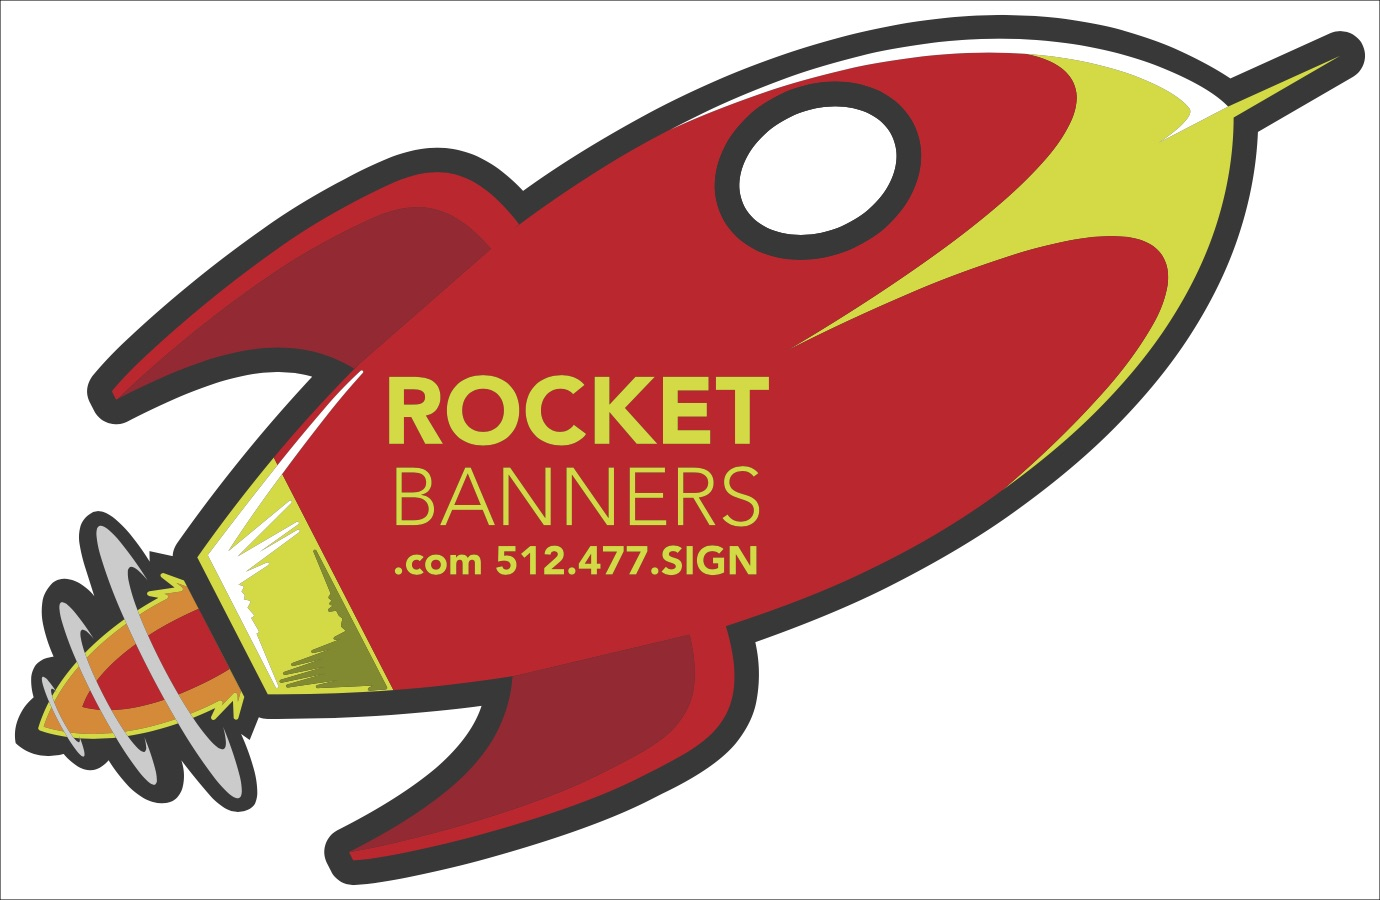 Rocket-Banners-Logo-Sponsor